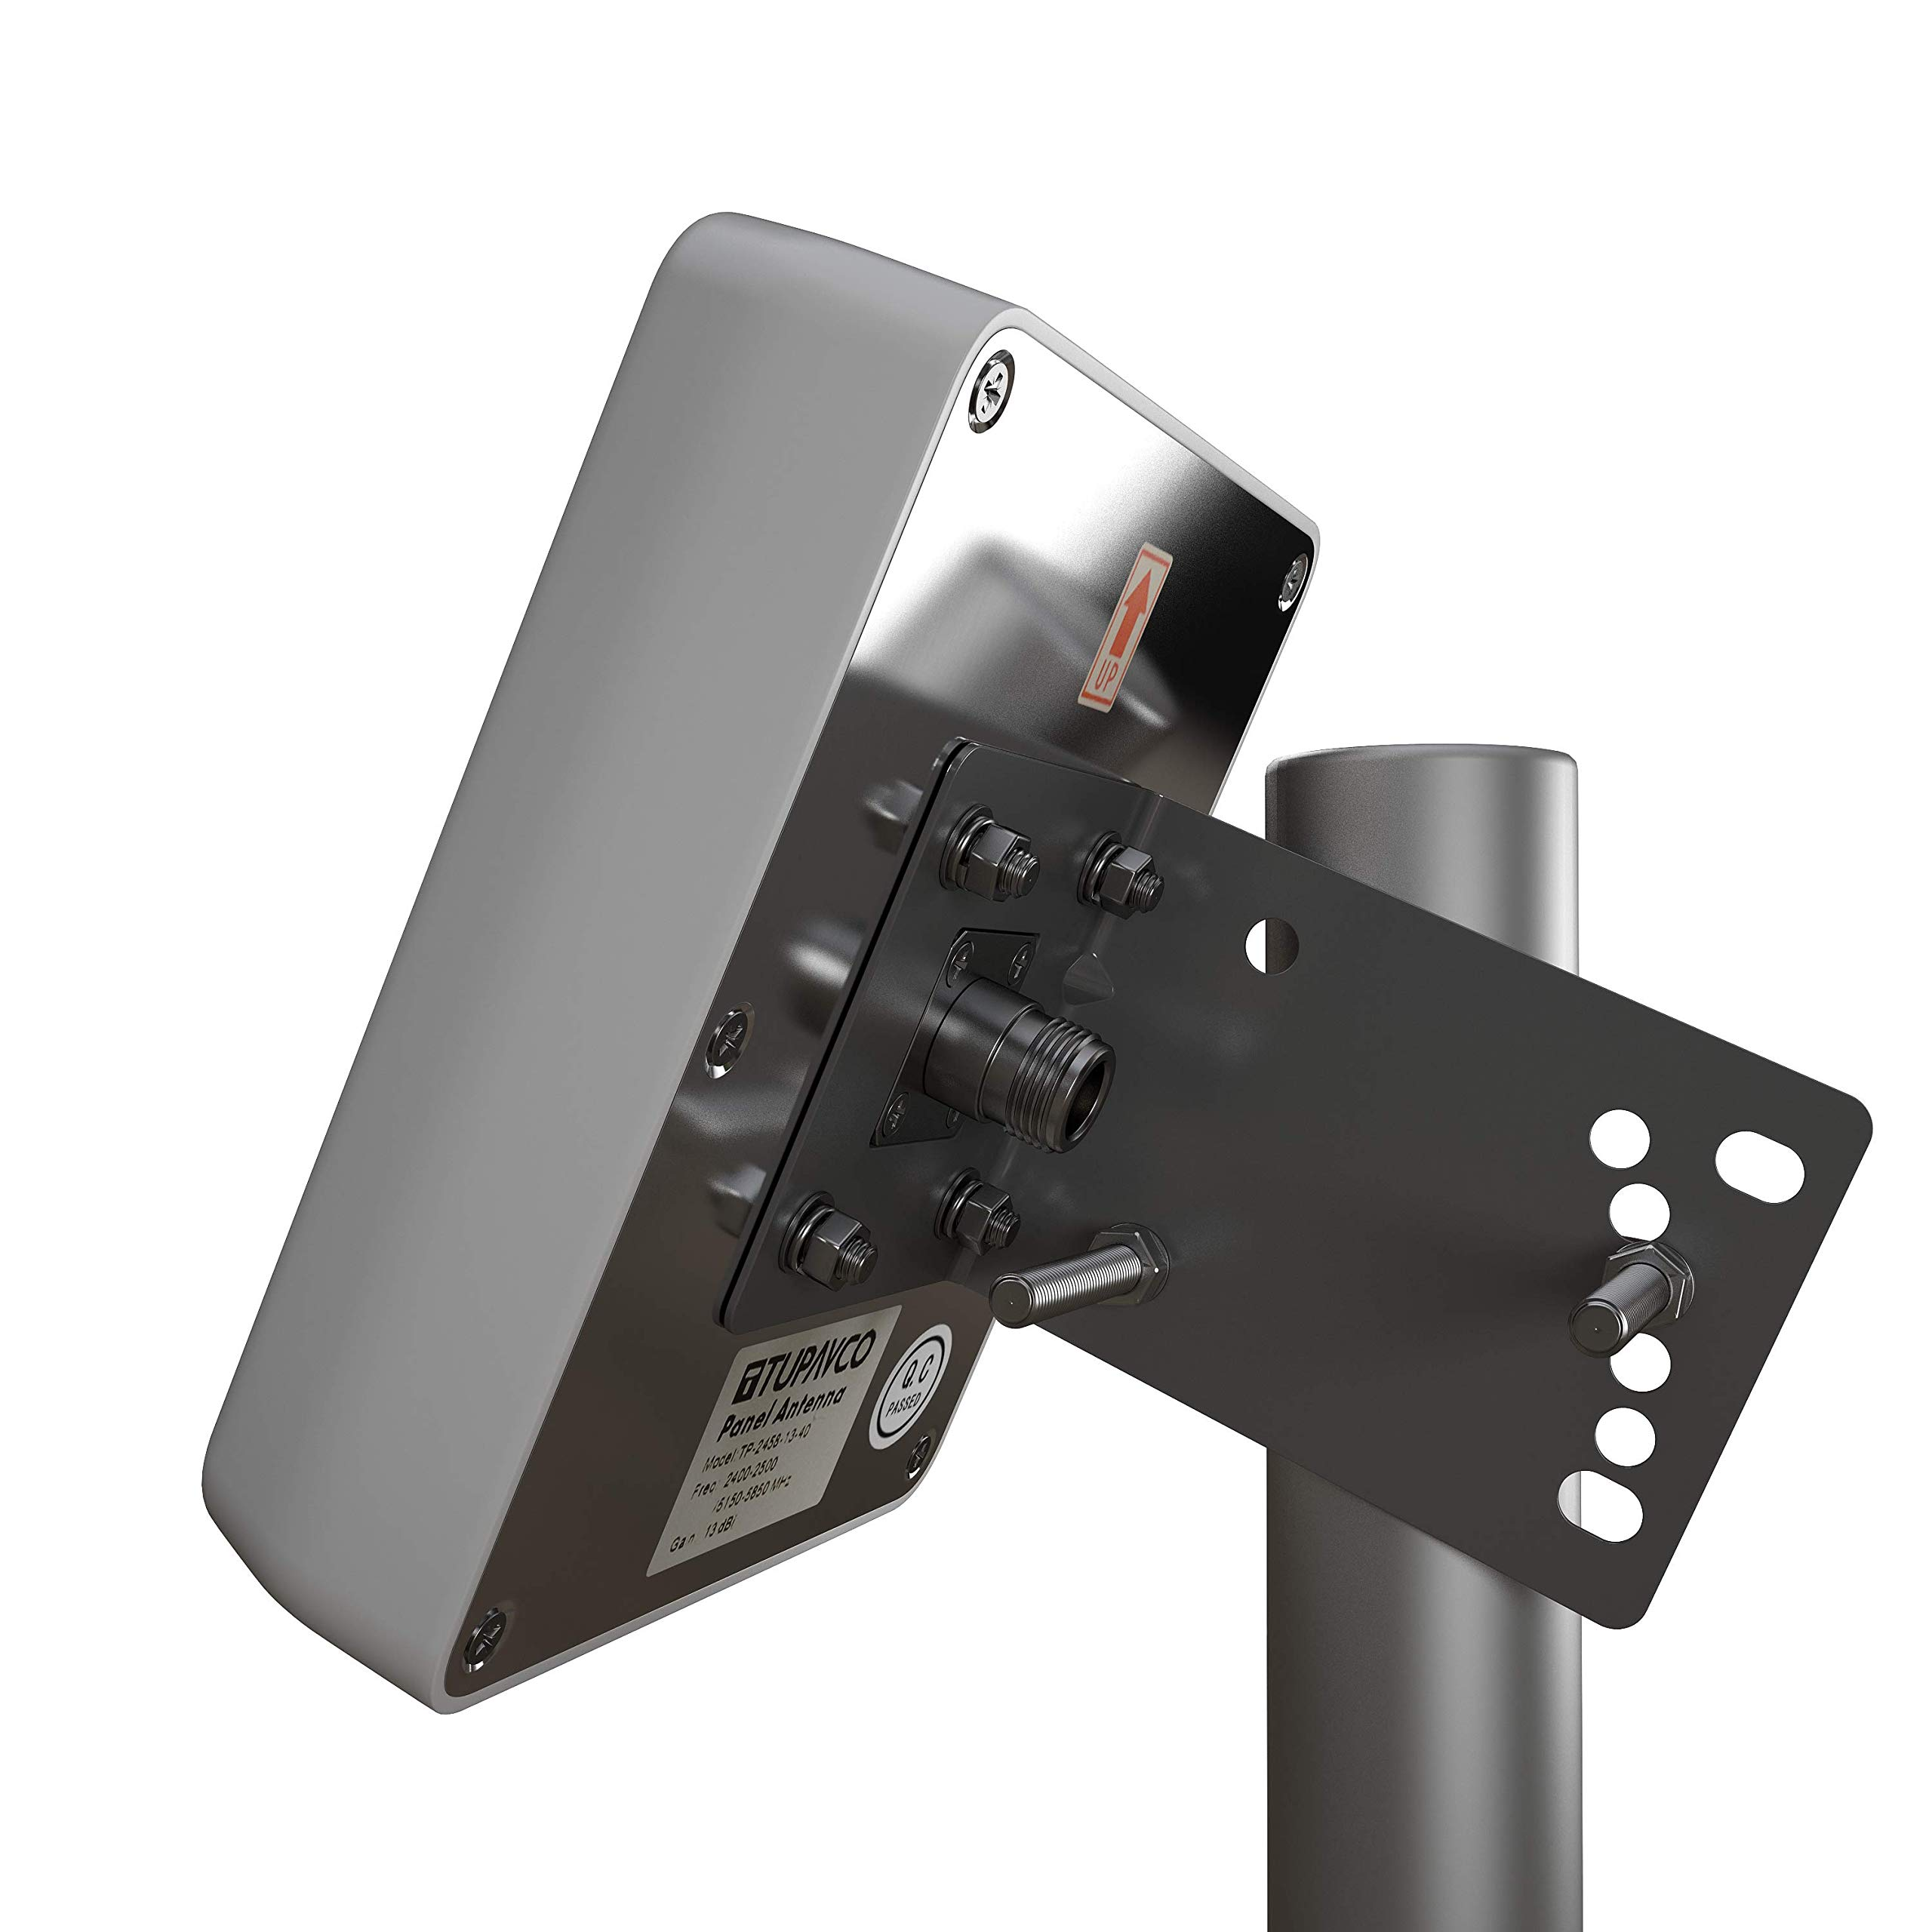 Panel WiFi Antenna 13dBi Dual Band//Multi Band 2.4GHz//5GHz-5.8GHz Range